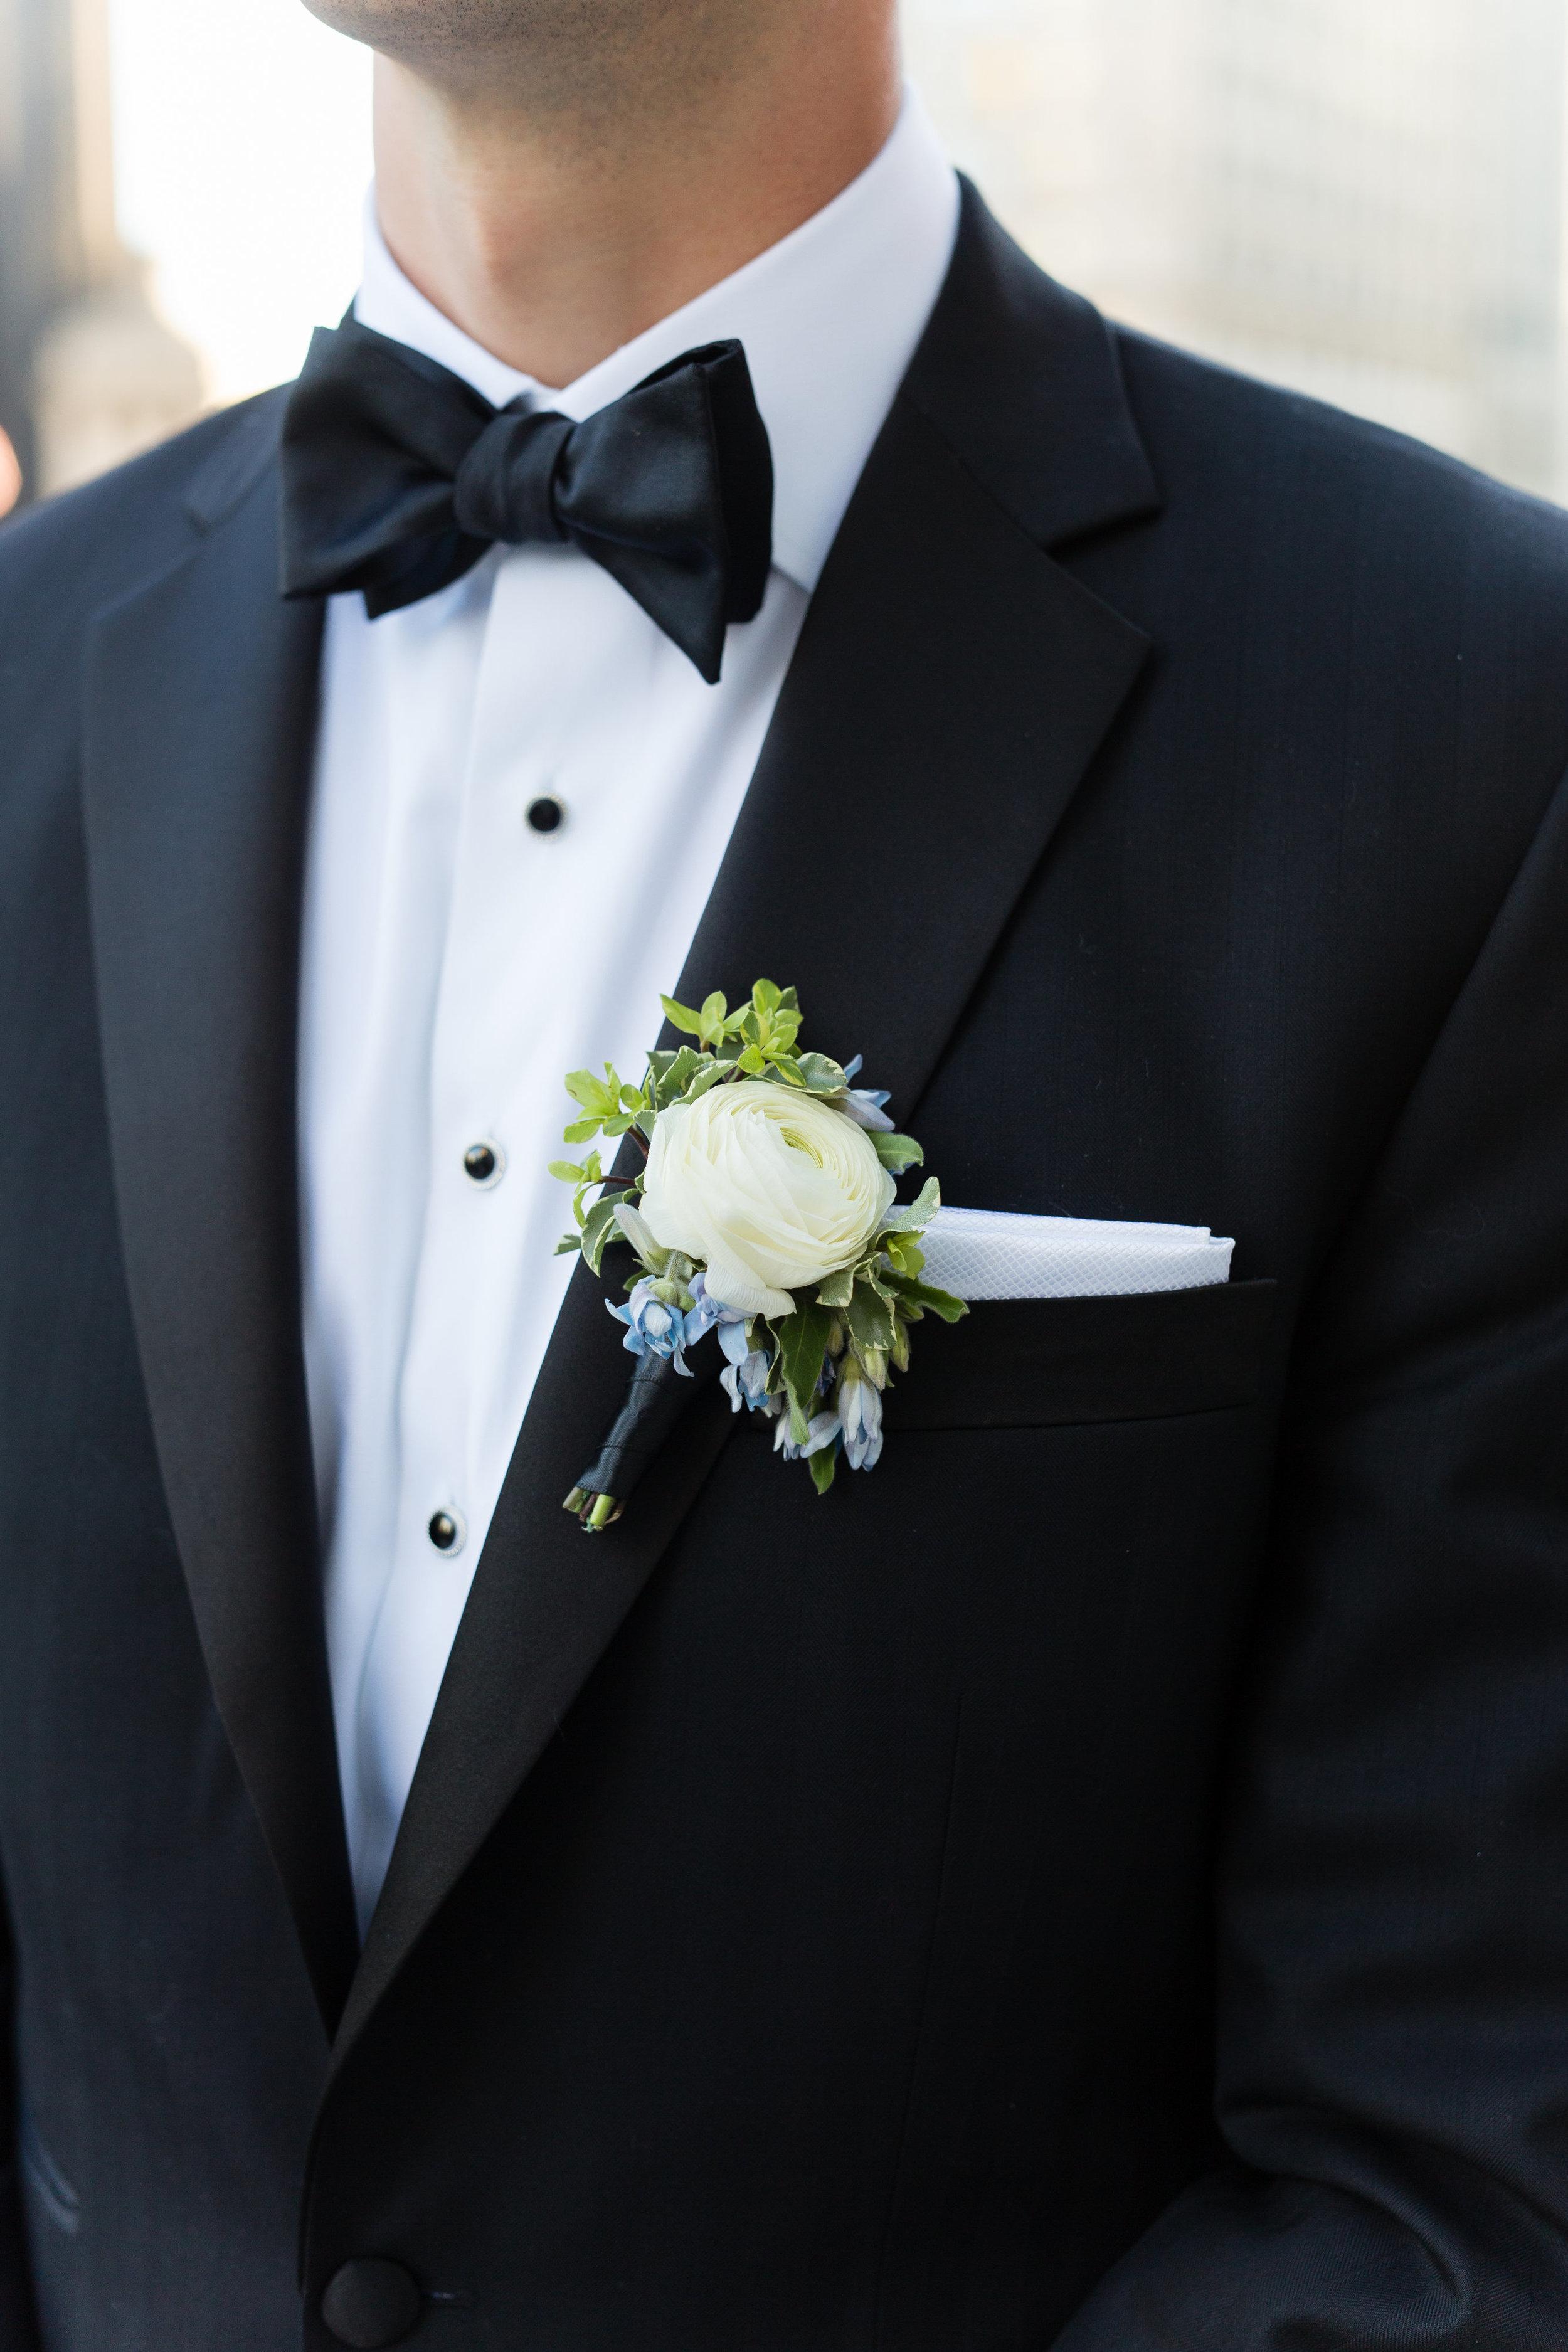 Fleur-Inc-Emilia-Jane-Photography-Estera-Events-Langham-Hotel-Chicago-Wedding-Ranunculus-Boutonniere-Tweedia